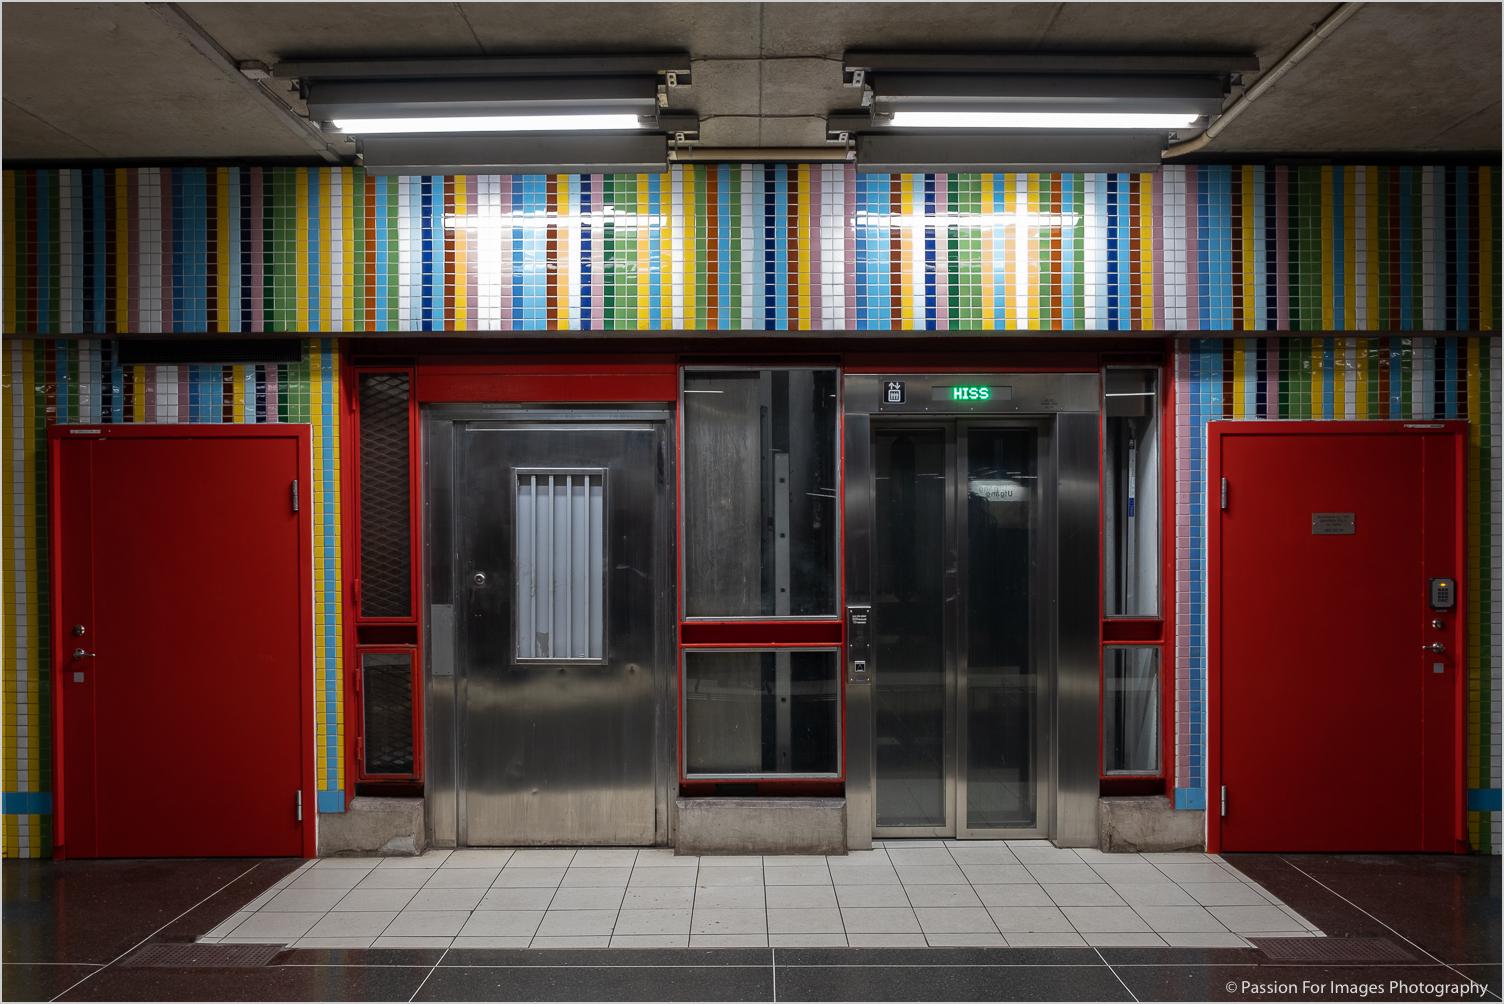 DSCF8868_2019_08_Skandinavien-Subway-Stockholm-Art-Project.jpg